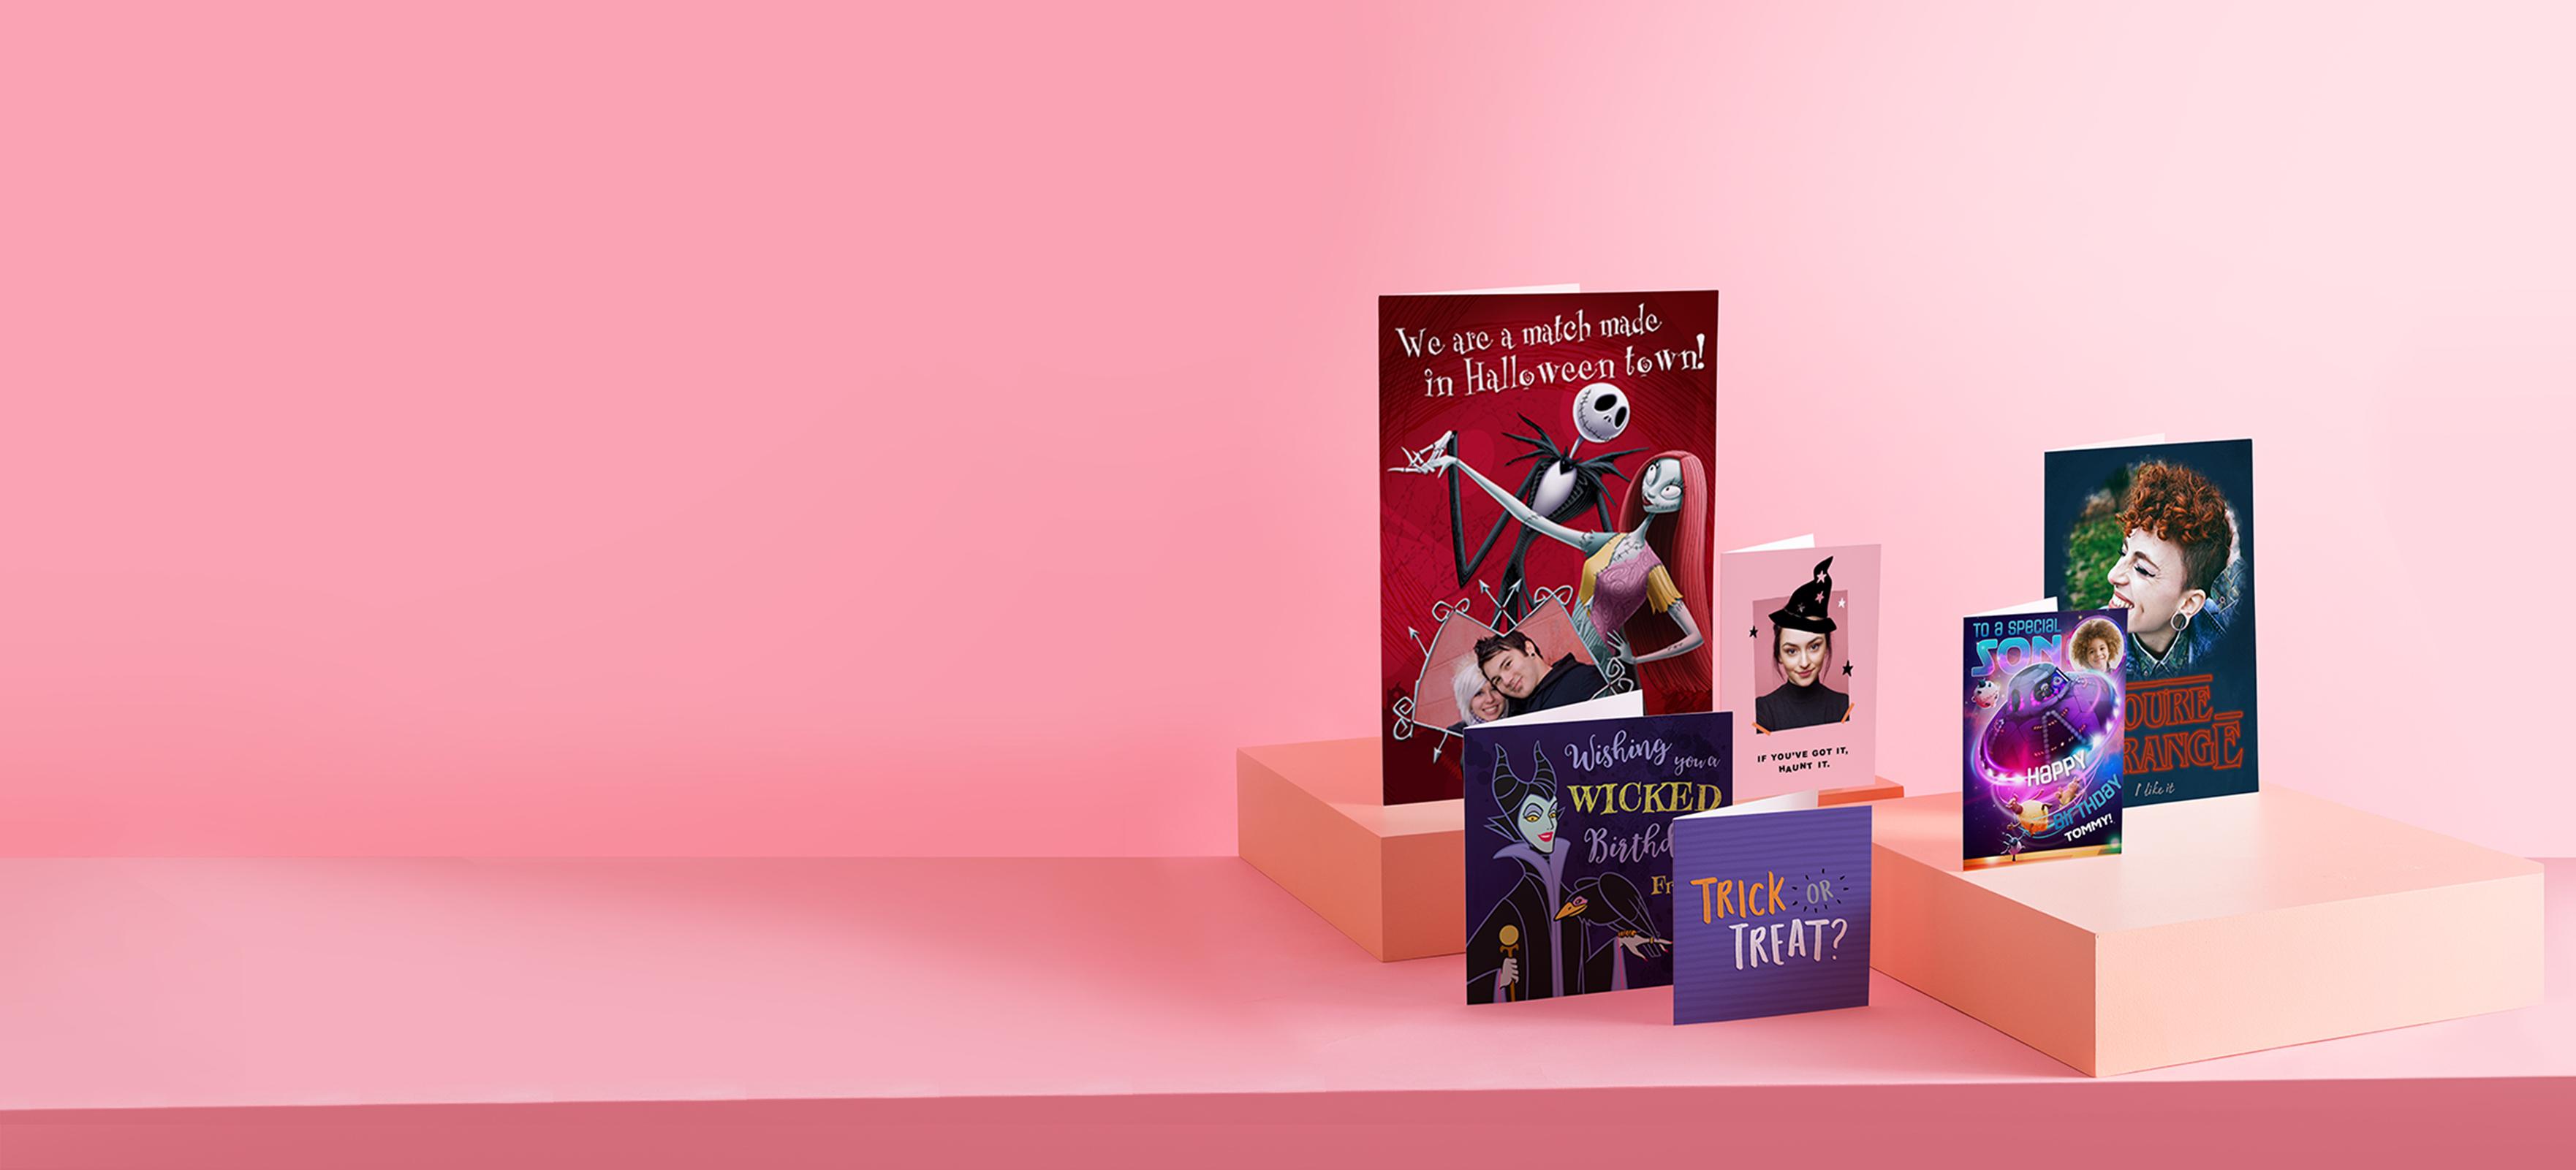 Personalised Birthday Cards Photo Upload Birthday Cards Moonpig